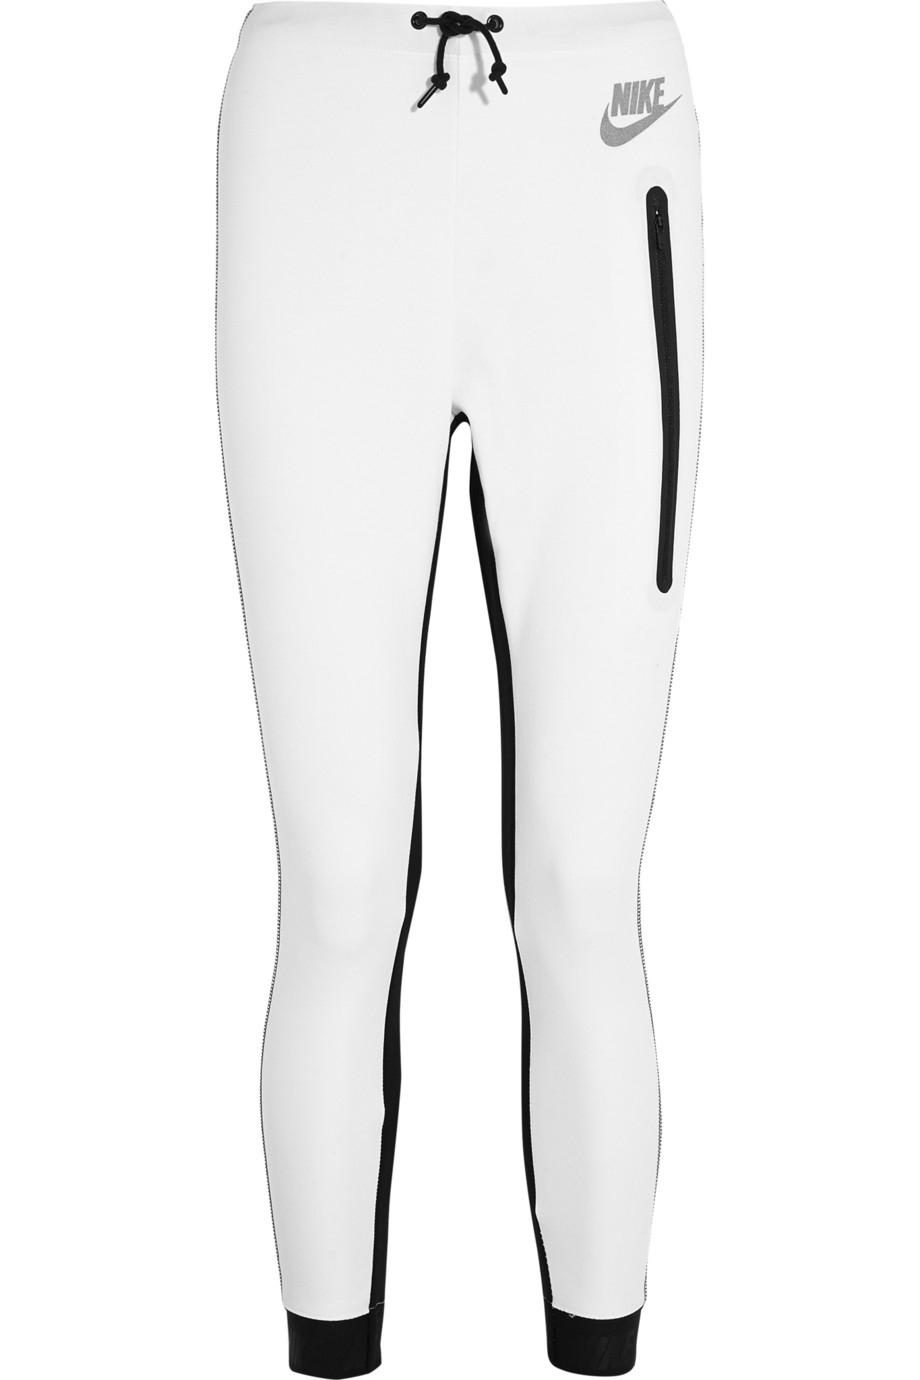 Nike Tech Fleece Cotton-Blend Jersey Track Pants in White - Lyst 67f6a7873